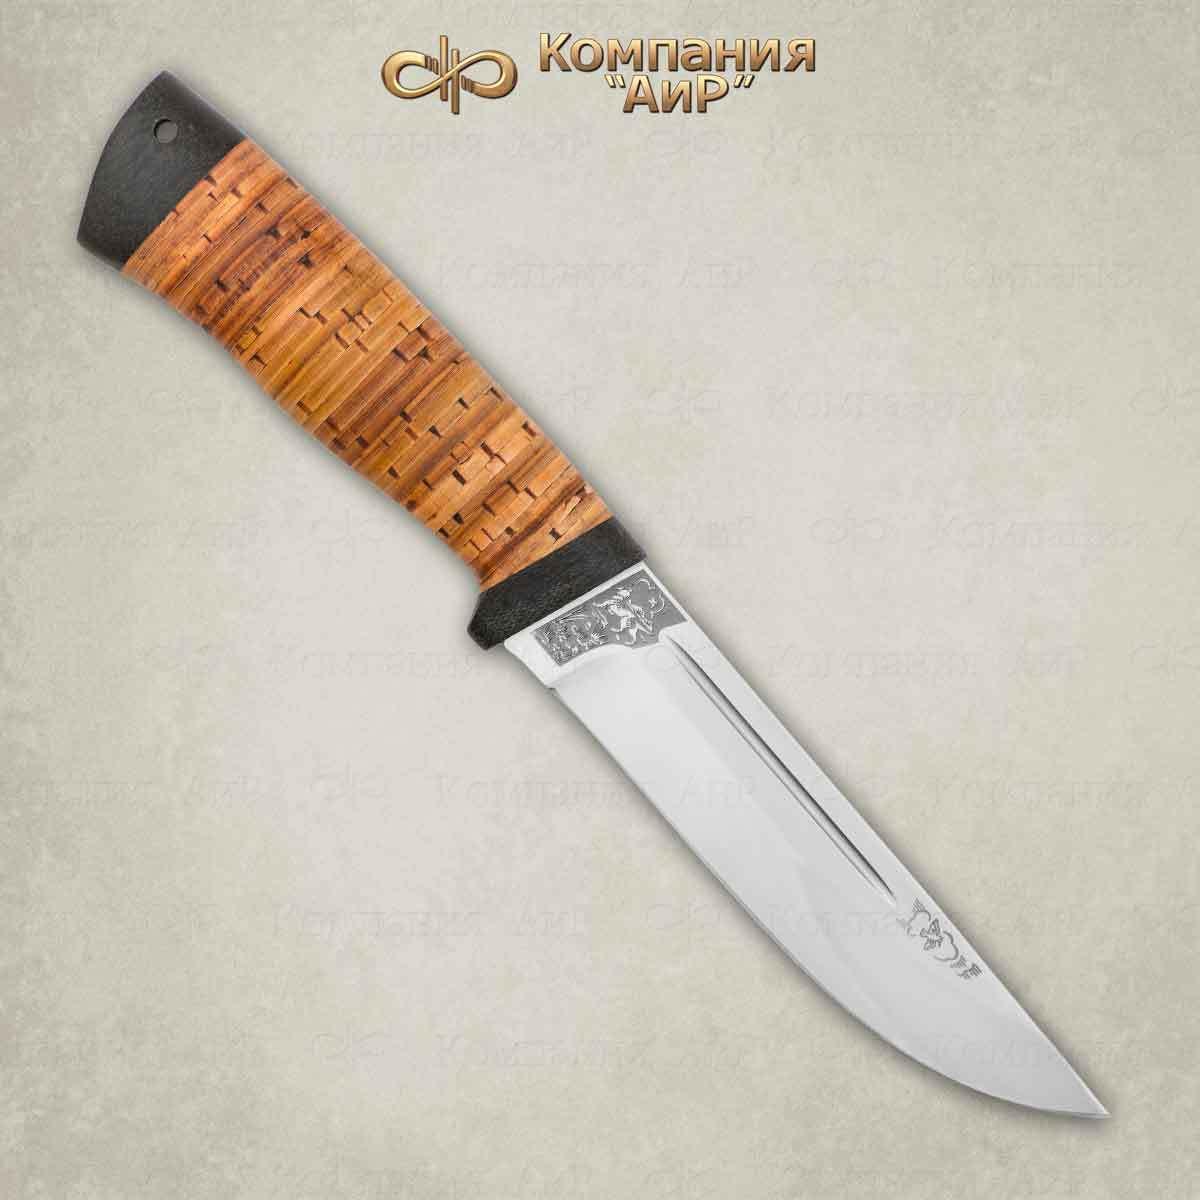 Нож Бекас, 100х13м, береста, АиР